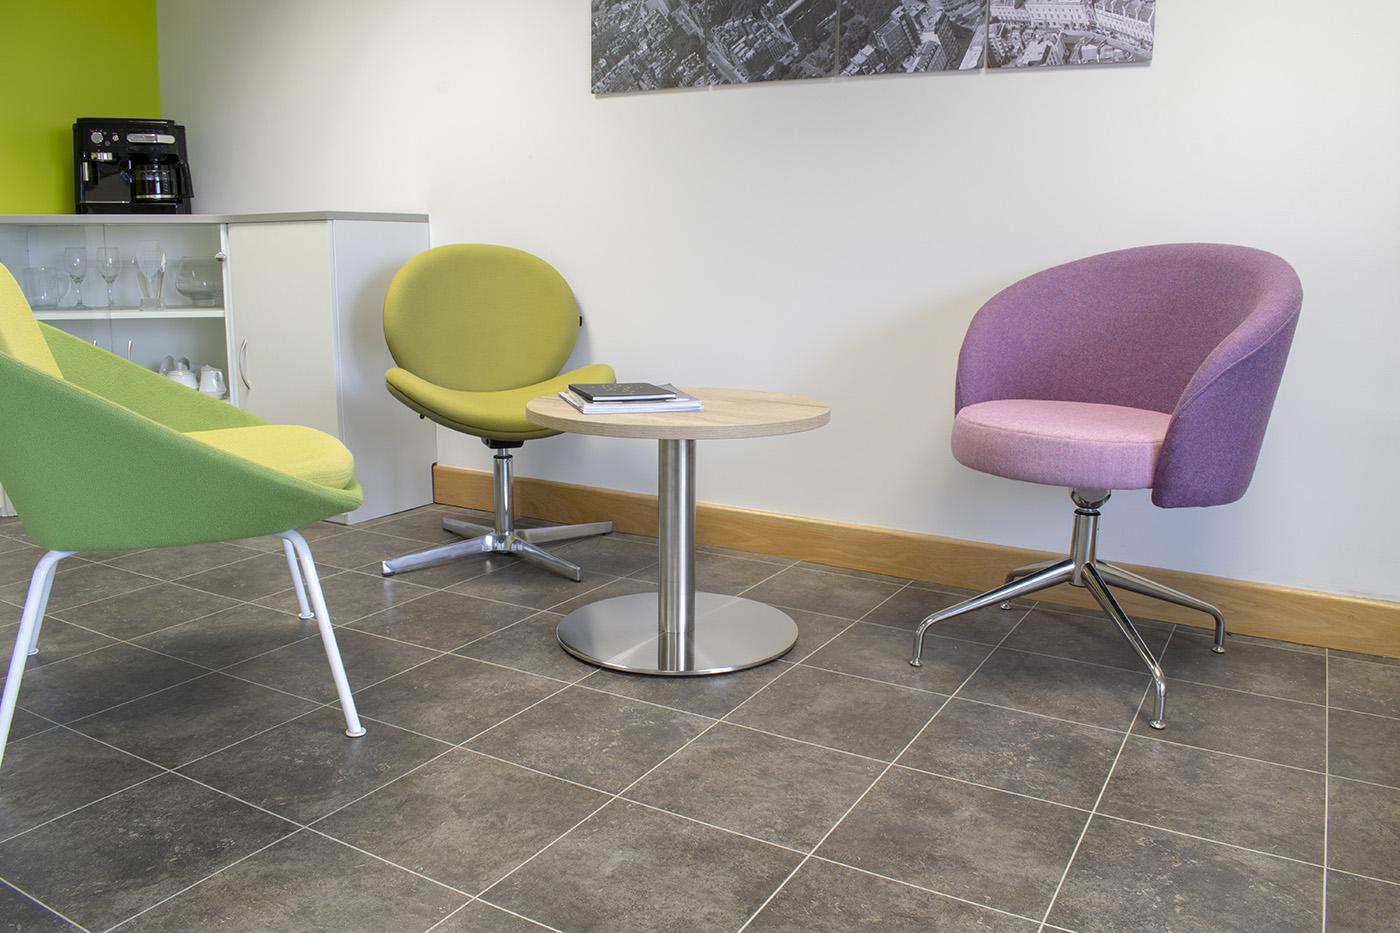 trumpet base table, reception table, coffee table, circular table, halifax oak table, silver base table, reception area, reception seating